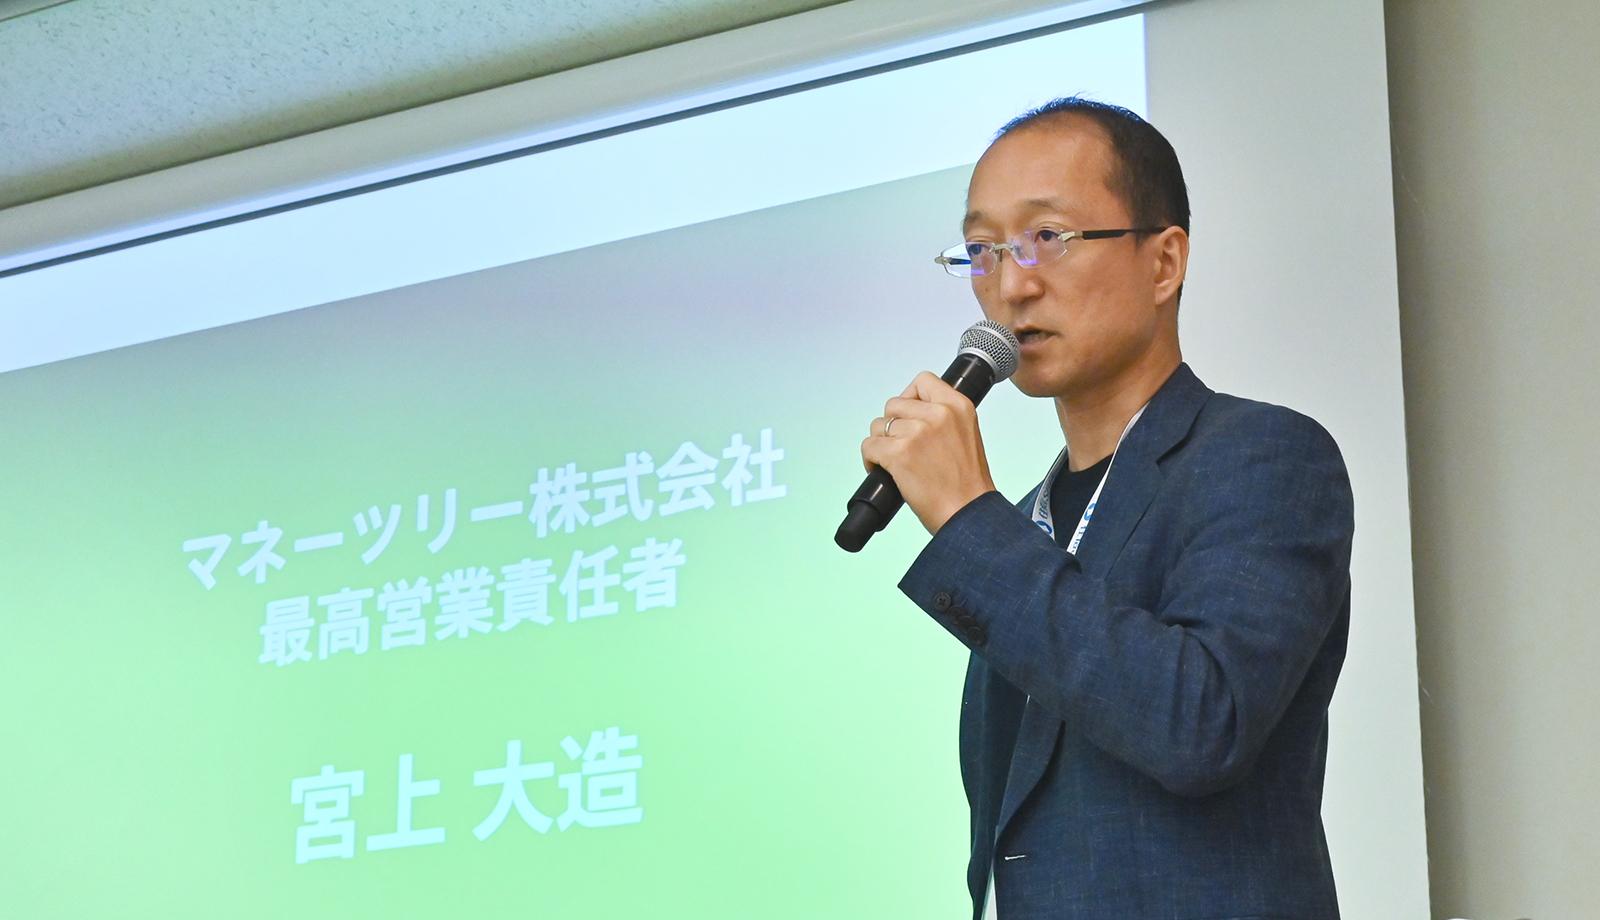 MT-Blog2B_FINSUM2019_Workshop_01